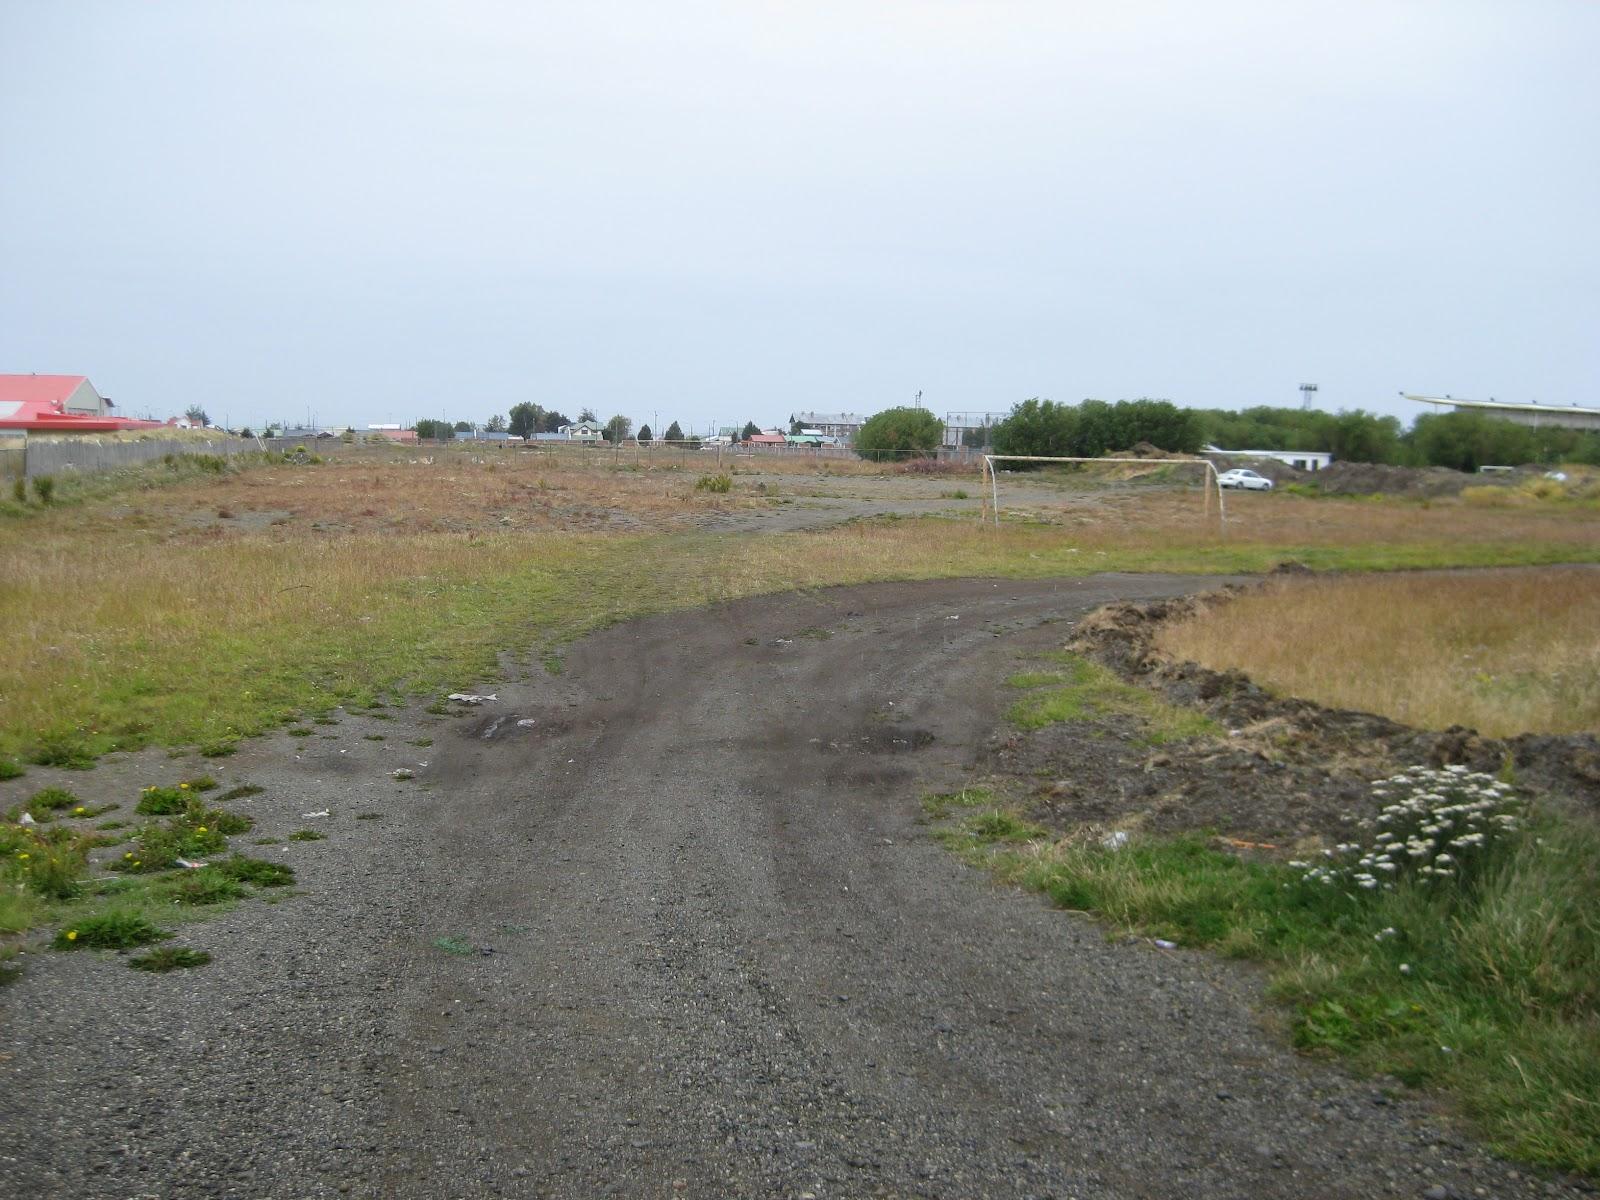 Derelict soccer field